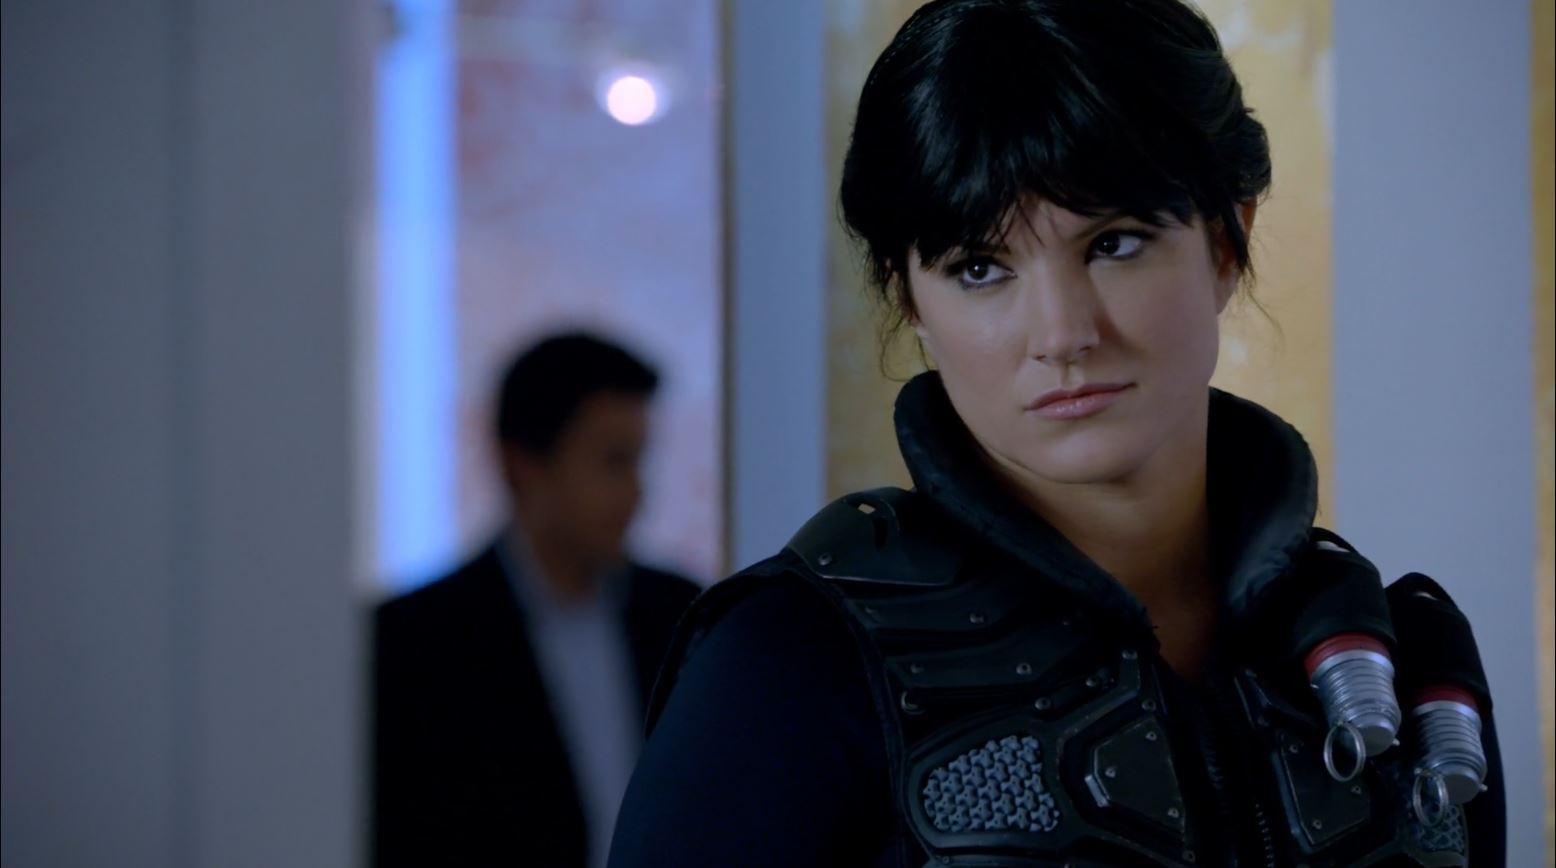 Almost Human - Unbound - Gina Carano as Danica A.K.A Terminatrix